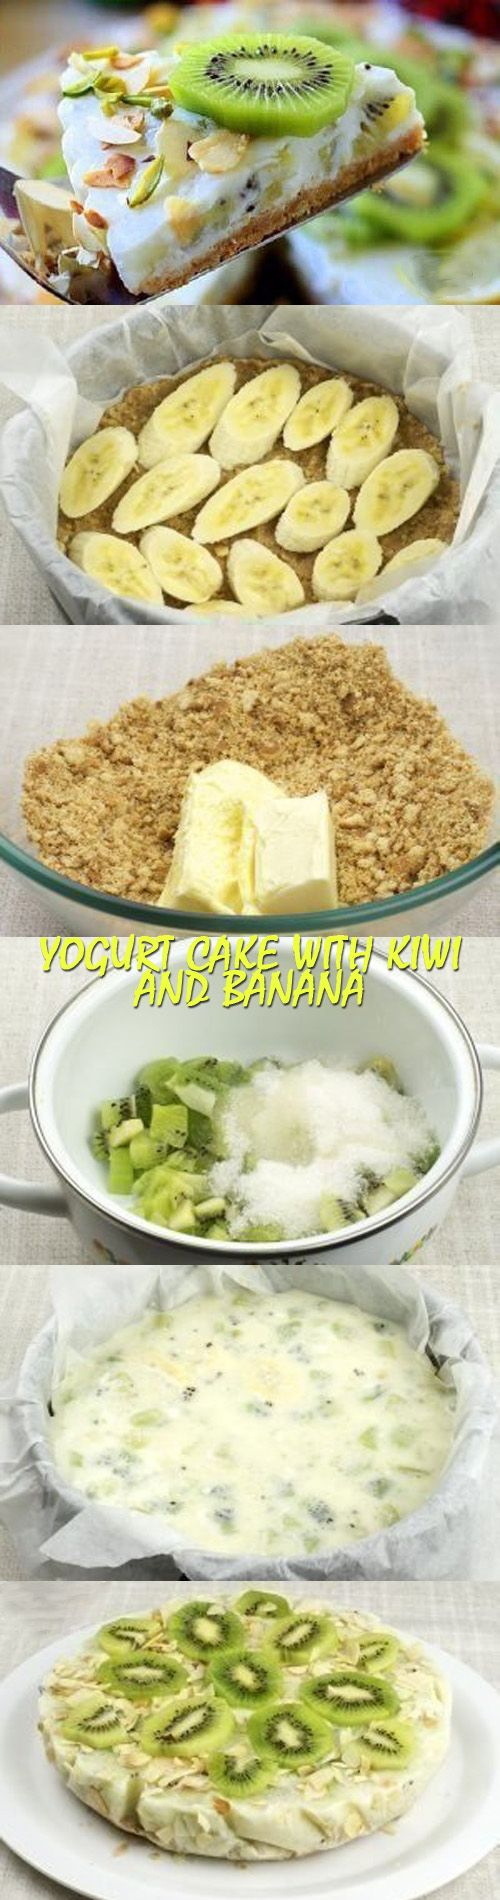 Yogurt cake with kiwi and banana